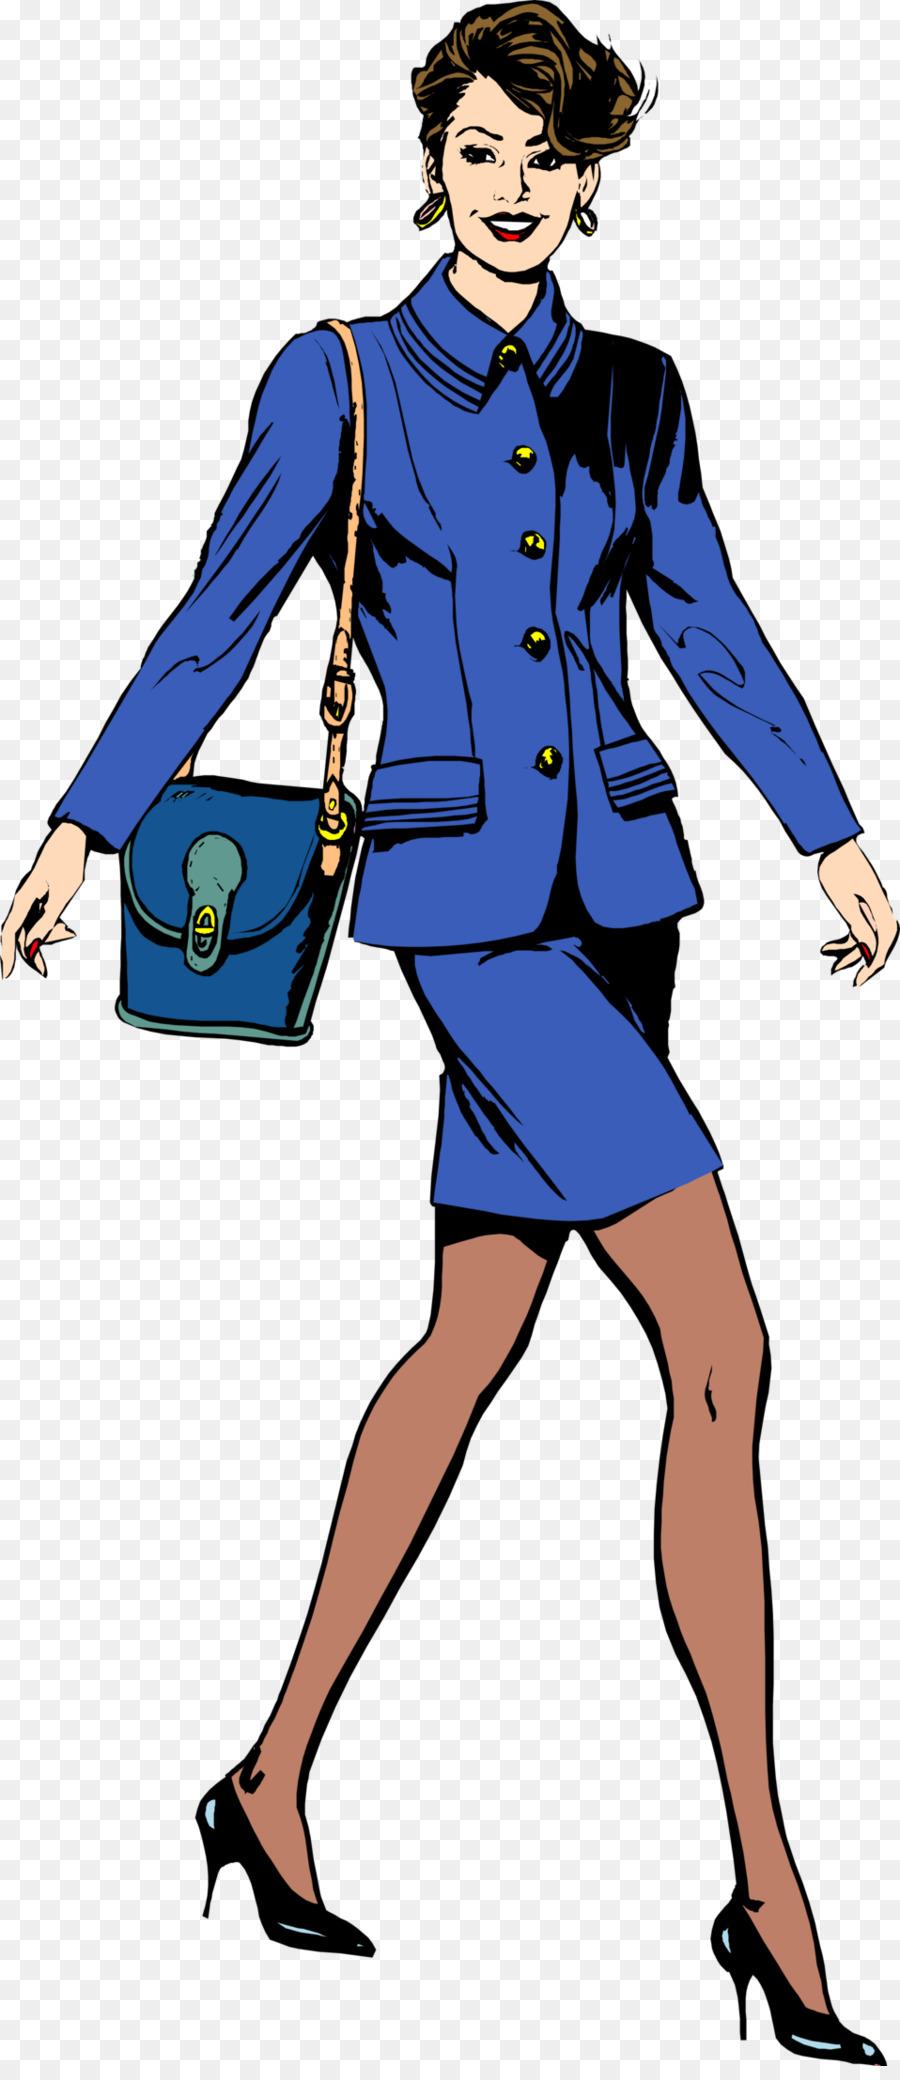 Clip art women walking. Businesswoman clipart supe woman